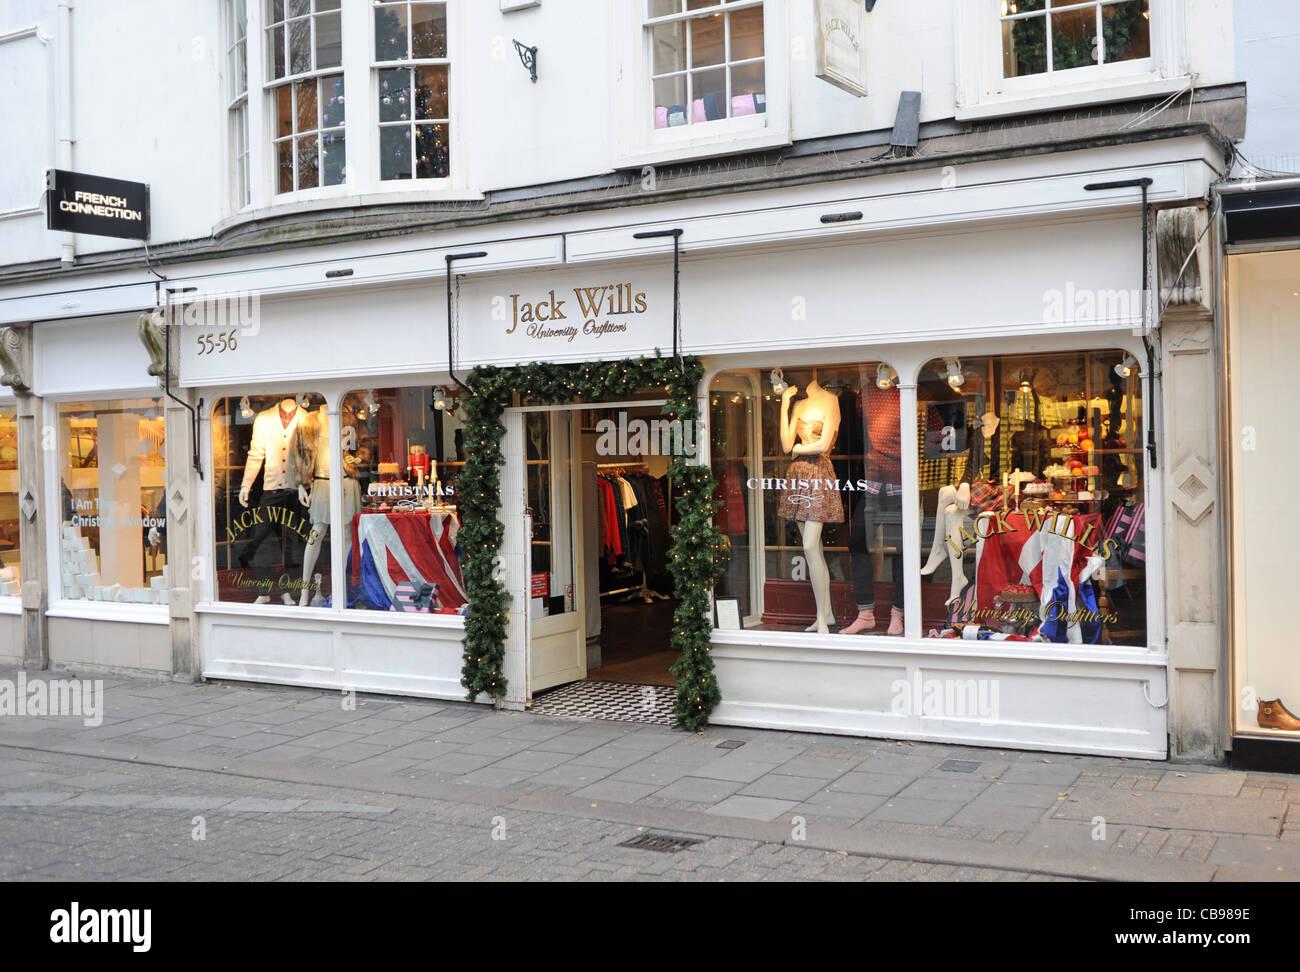 Jack Wills Fashion clothing store East Street Brighton UK Photograph taken December 2011 - Stock Image